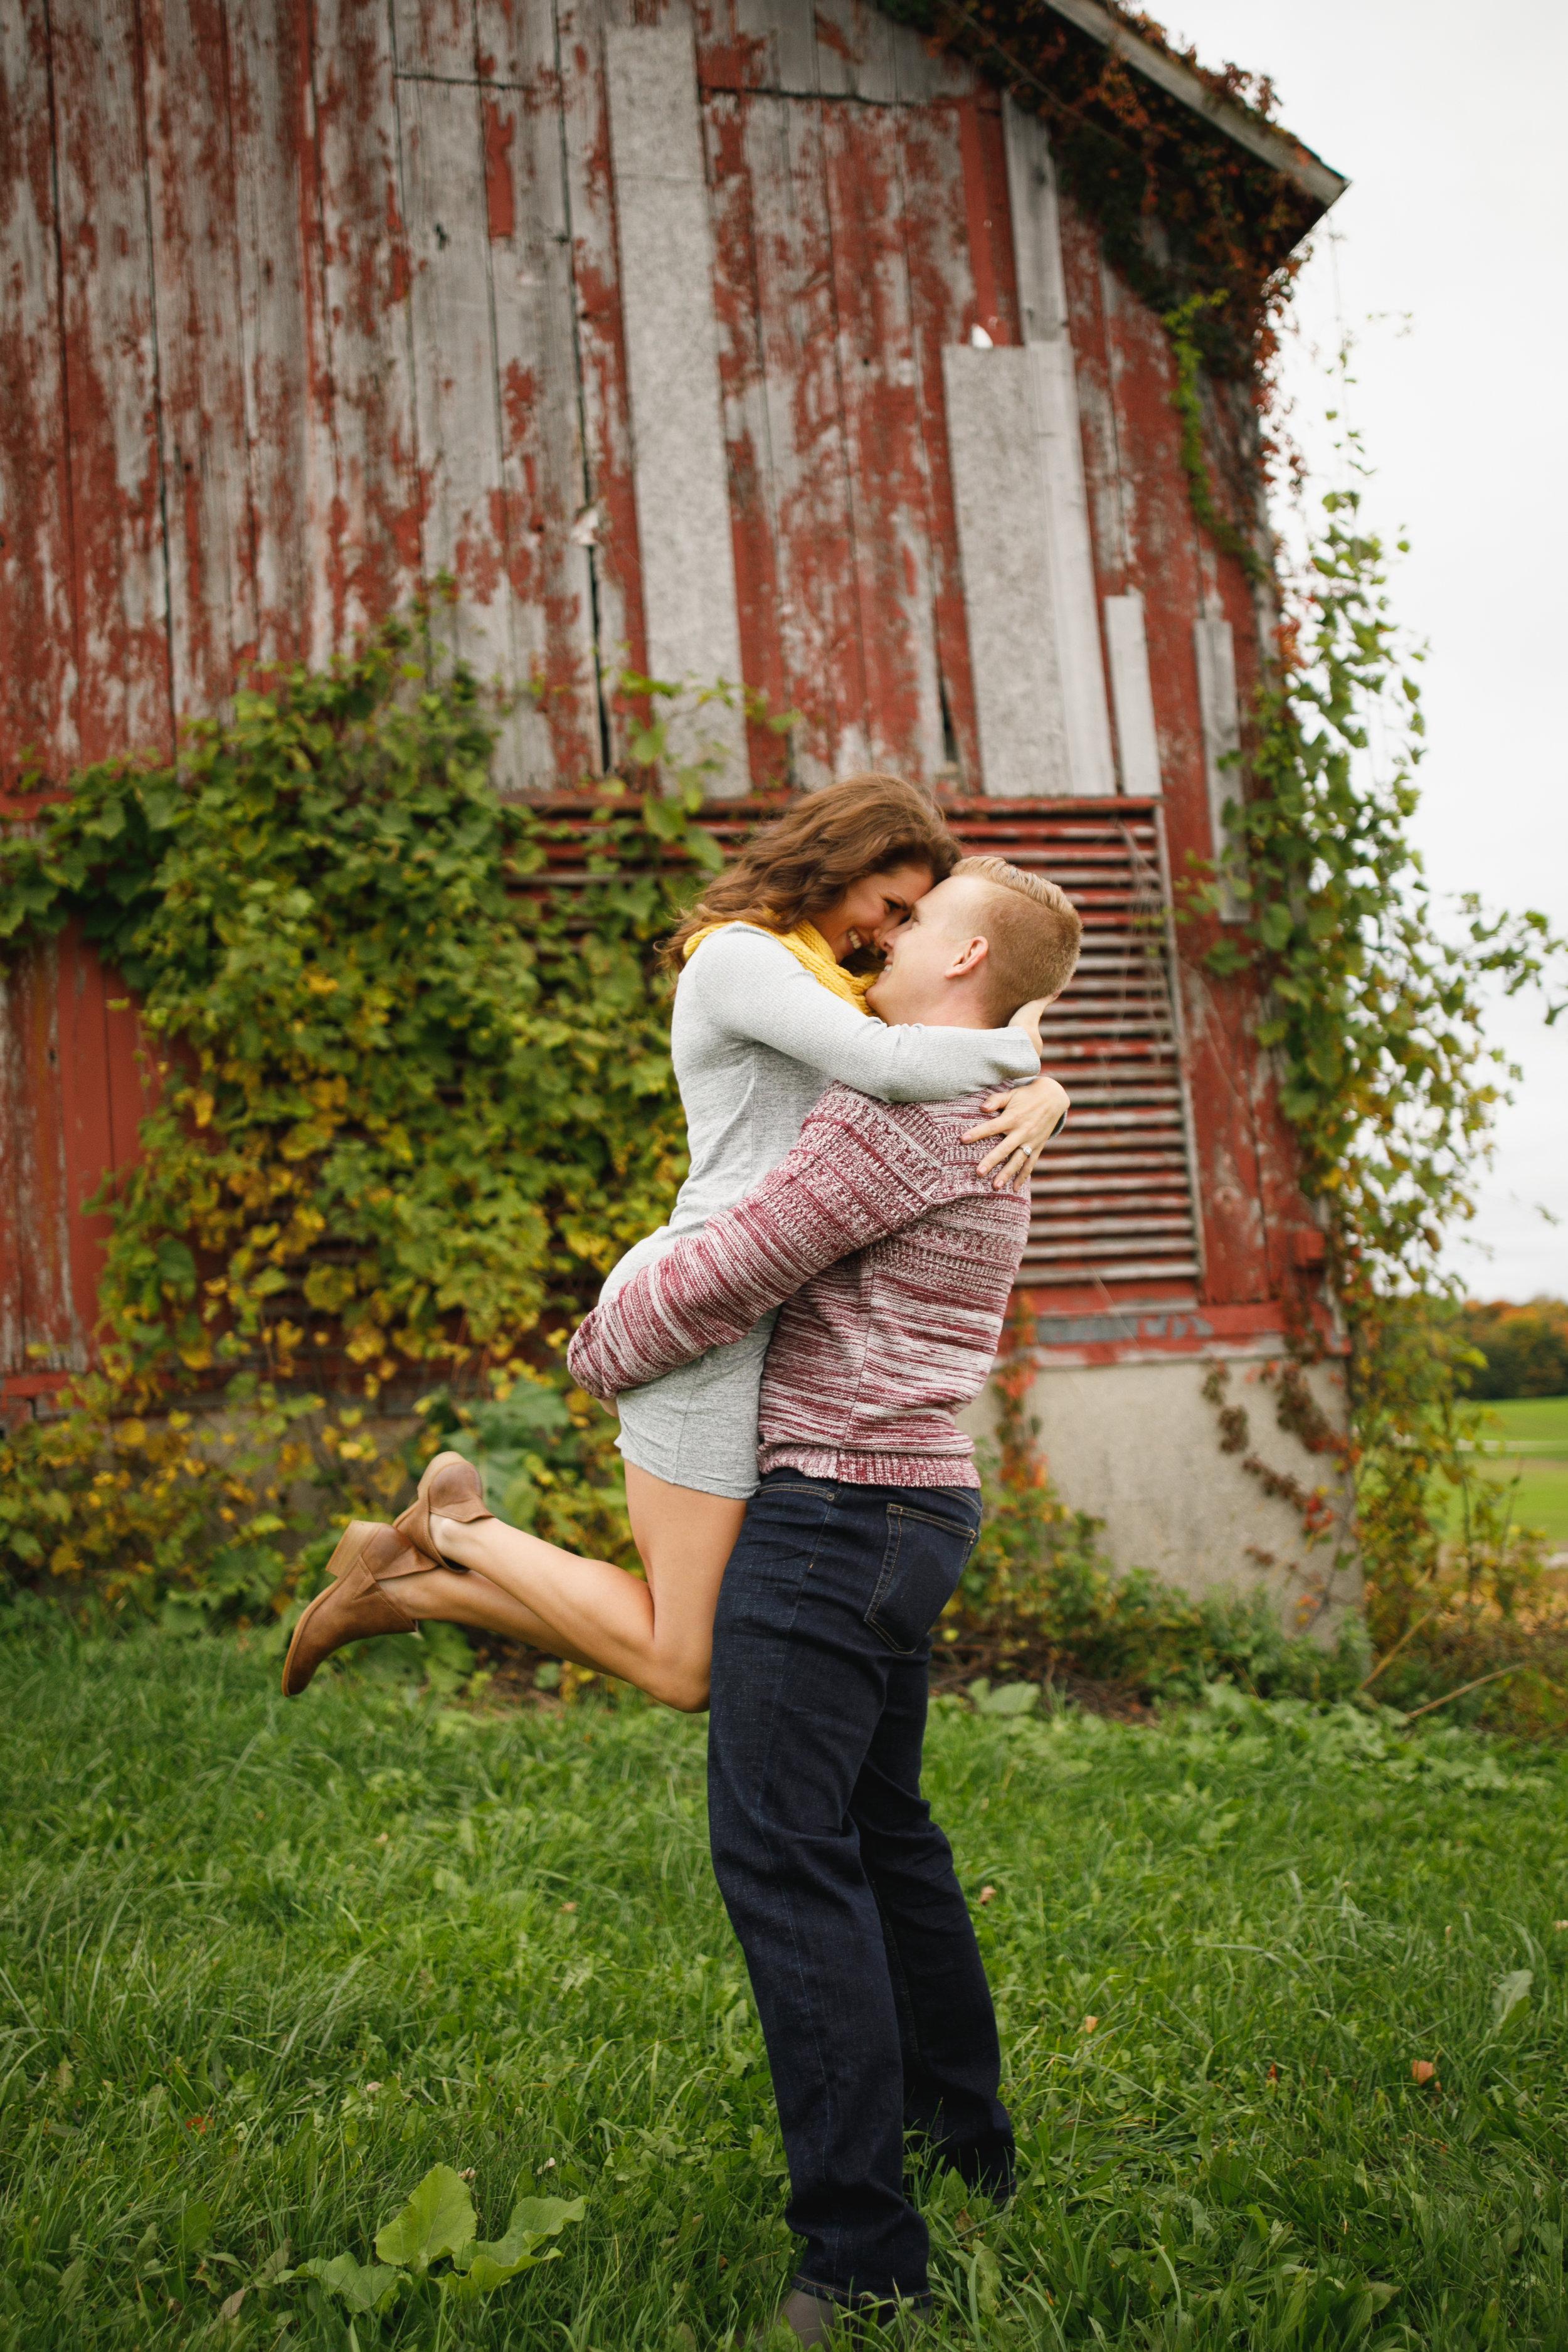 Karly and Sam Engaged - J Darling Photo 056.jpg